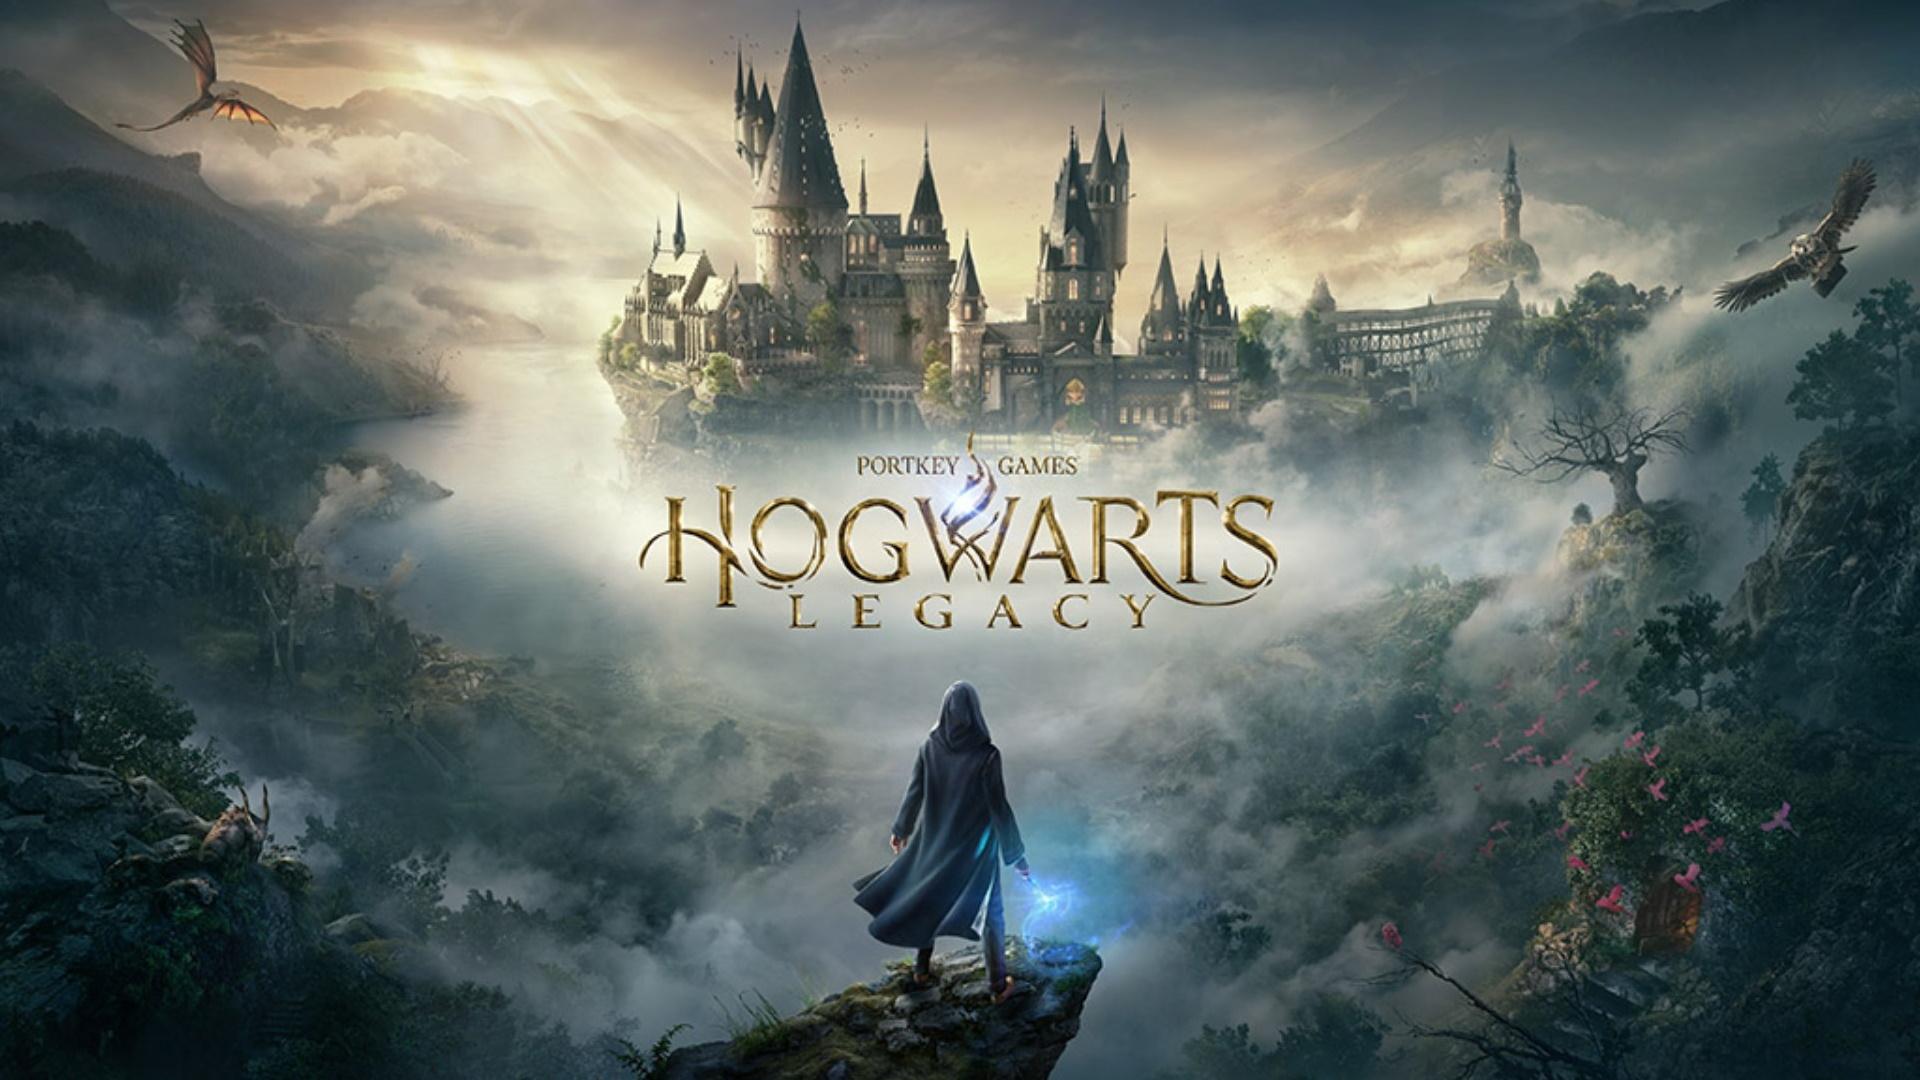 Hogwarts Legacy featured